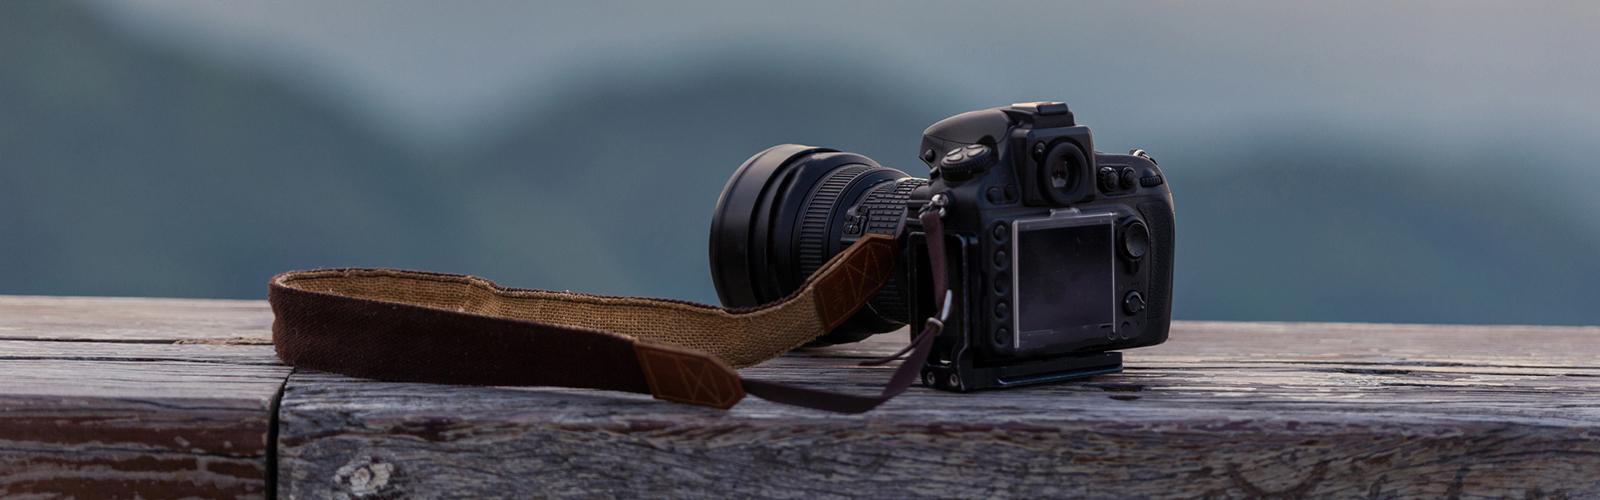 Image: camera